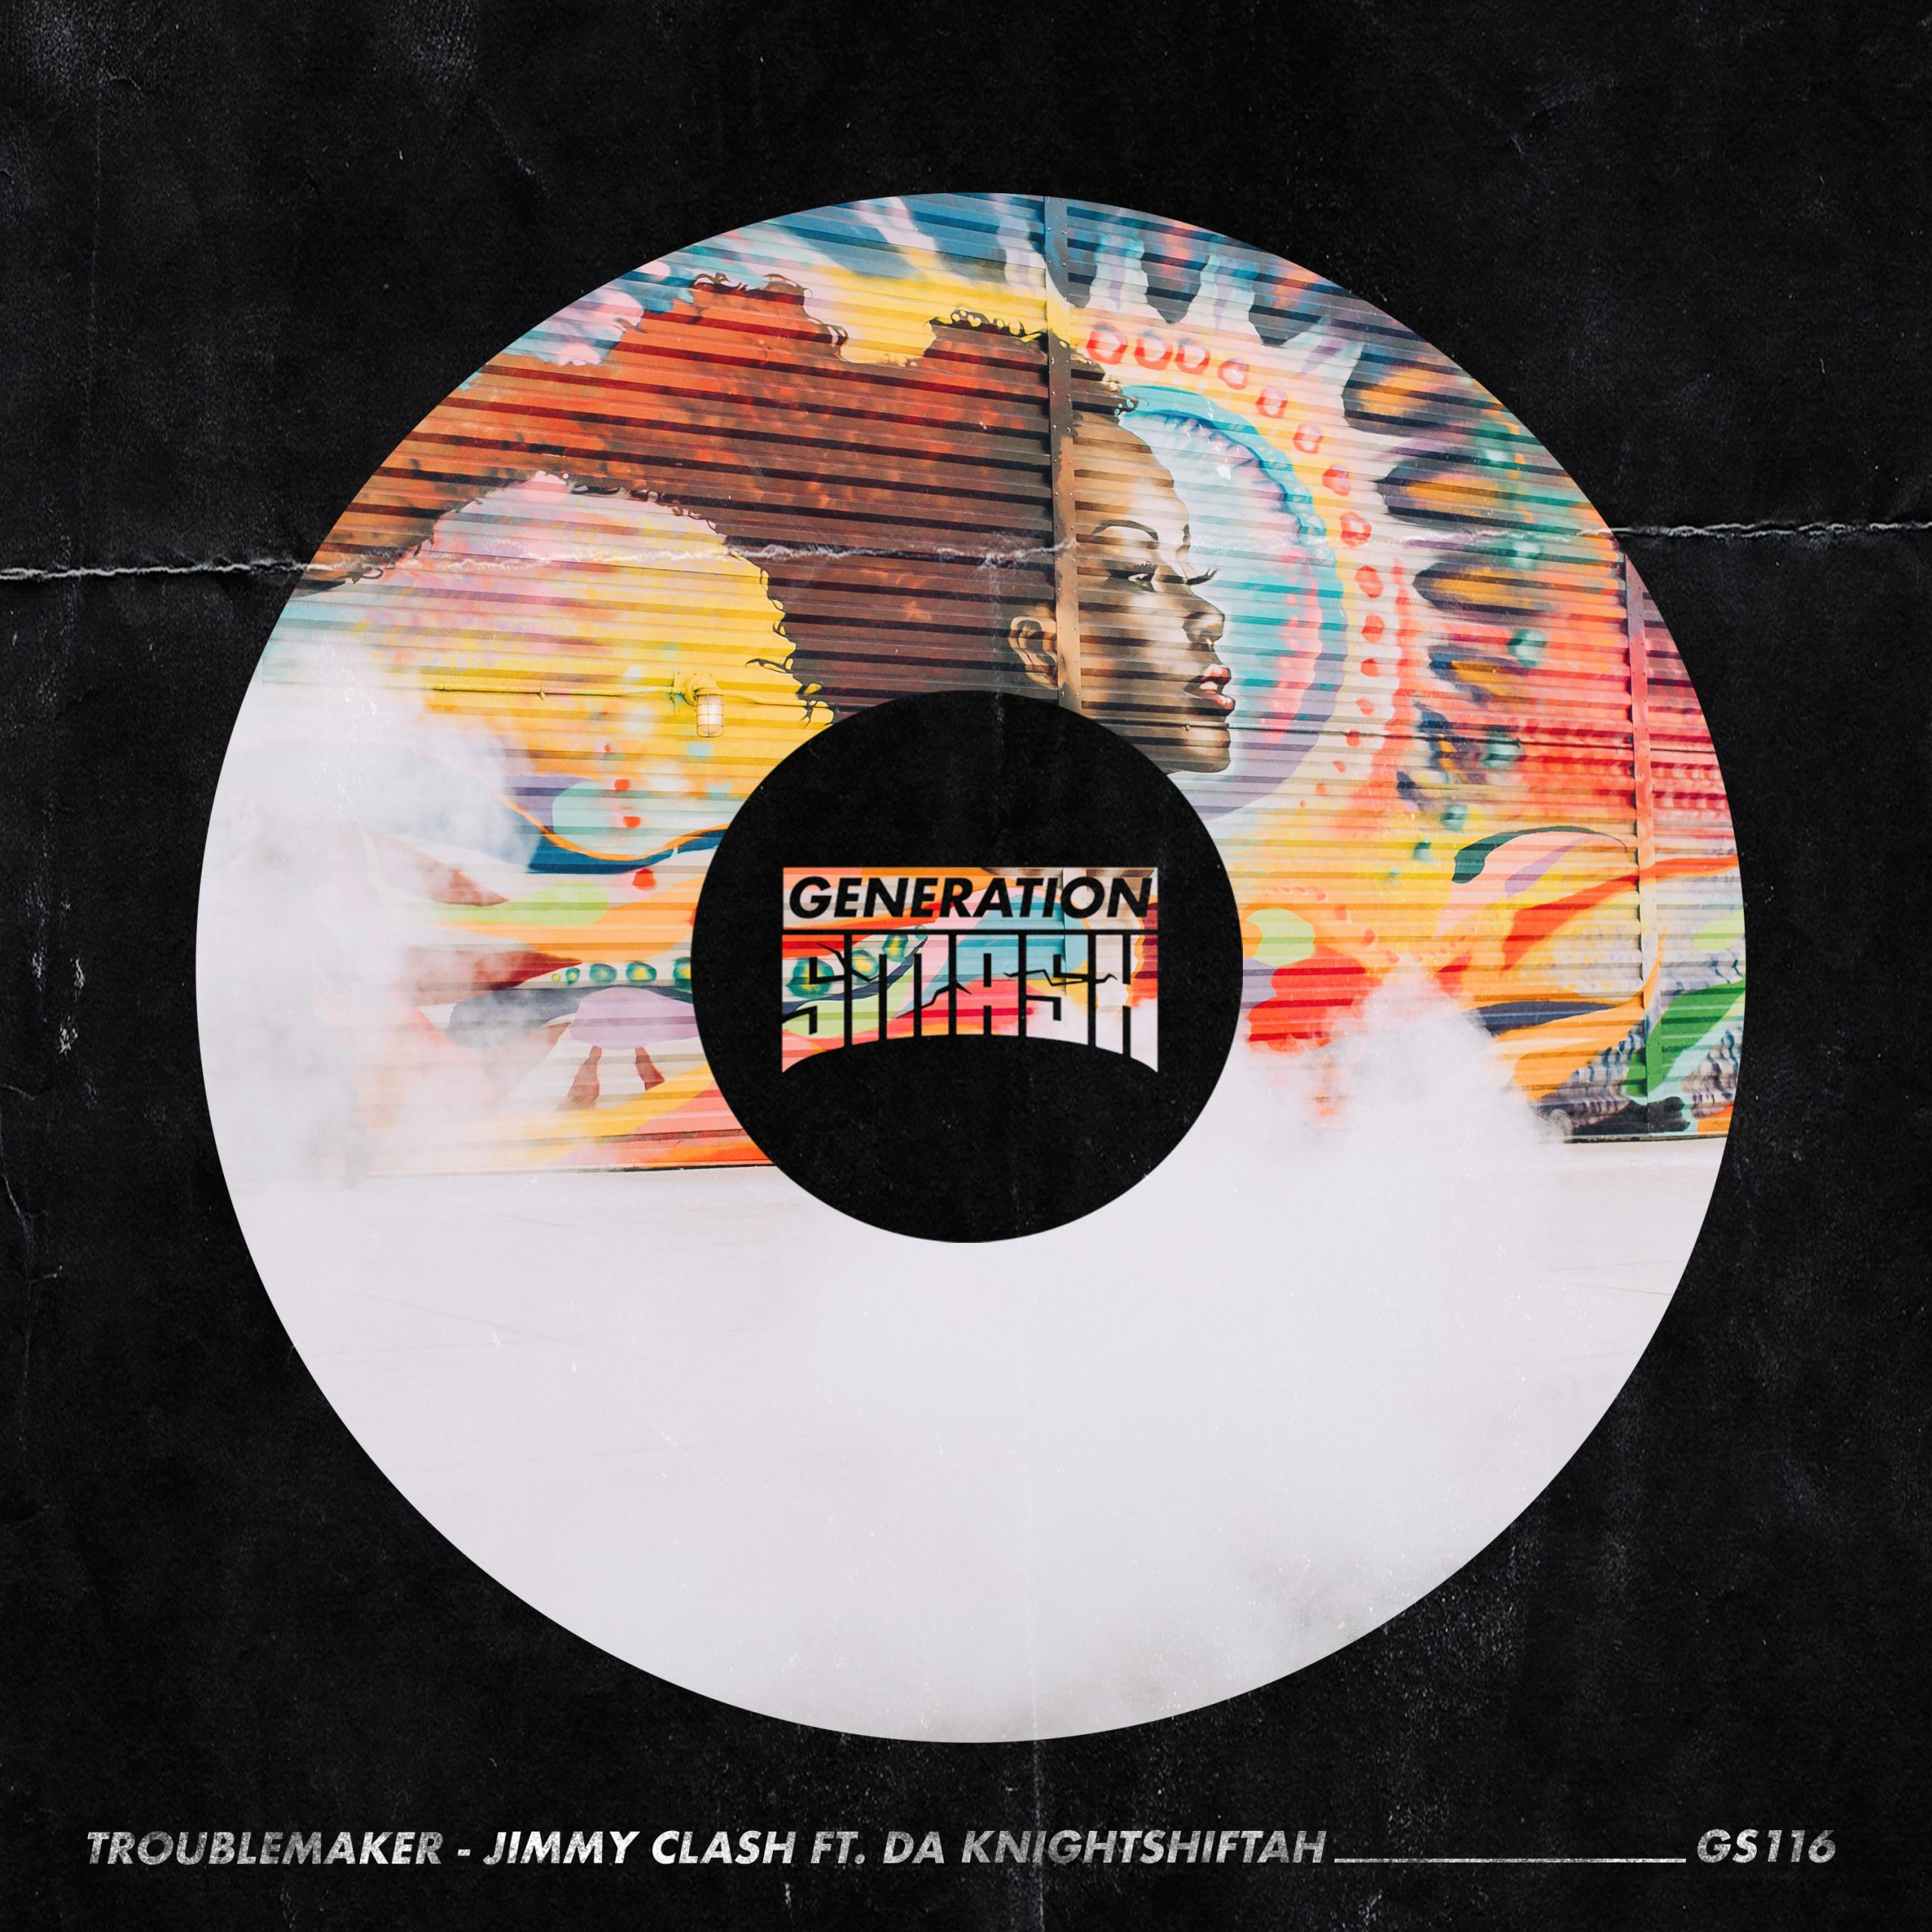 Jimmy Clash - Troublemaker ft. Da Knightshiftah [Generation Smash]